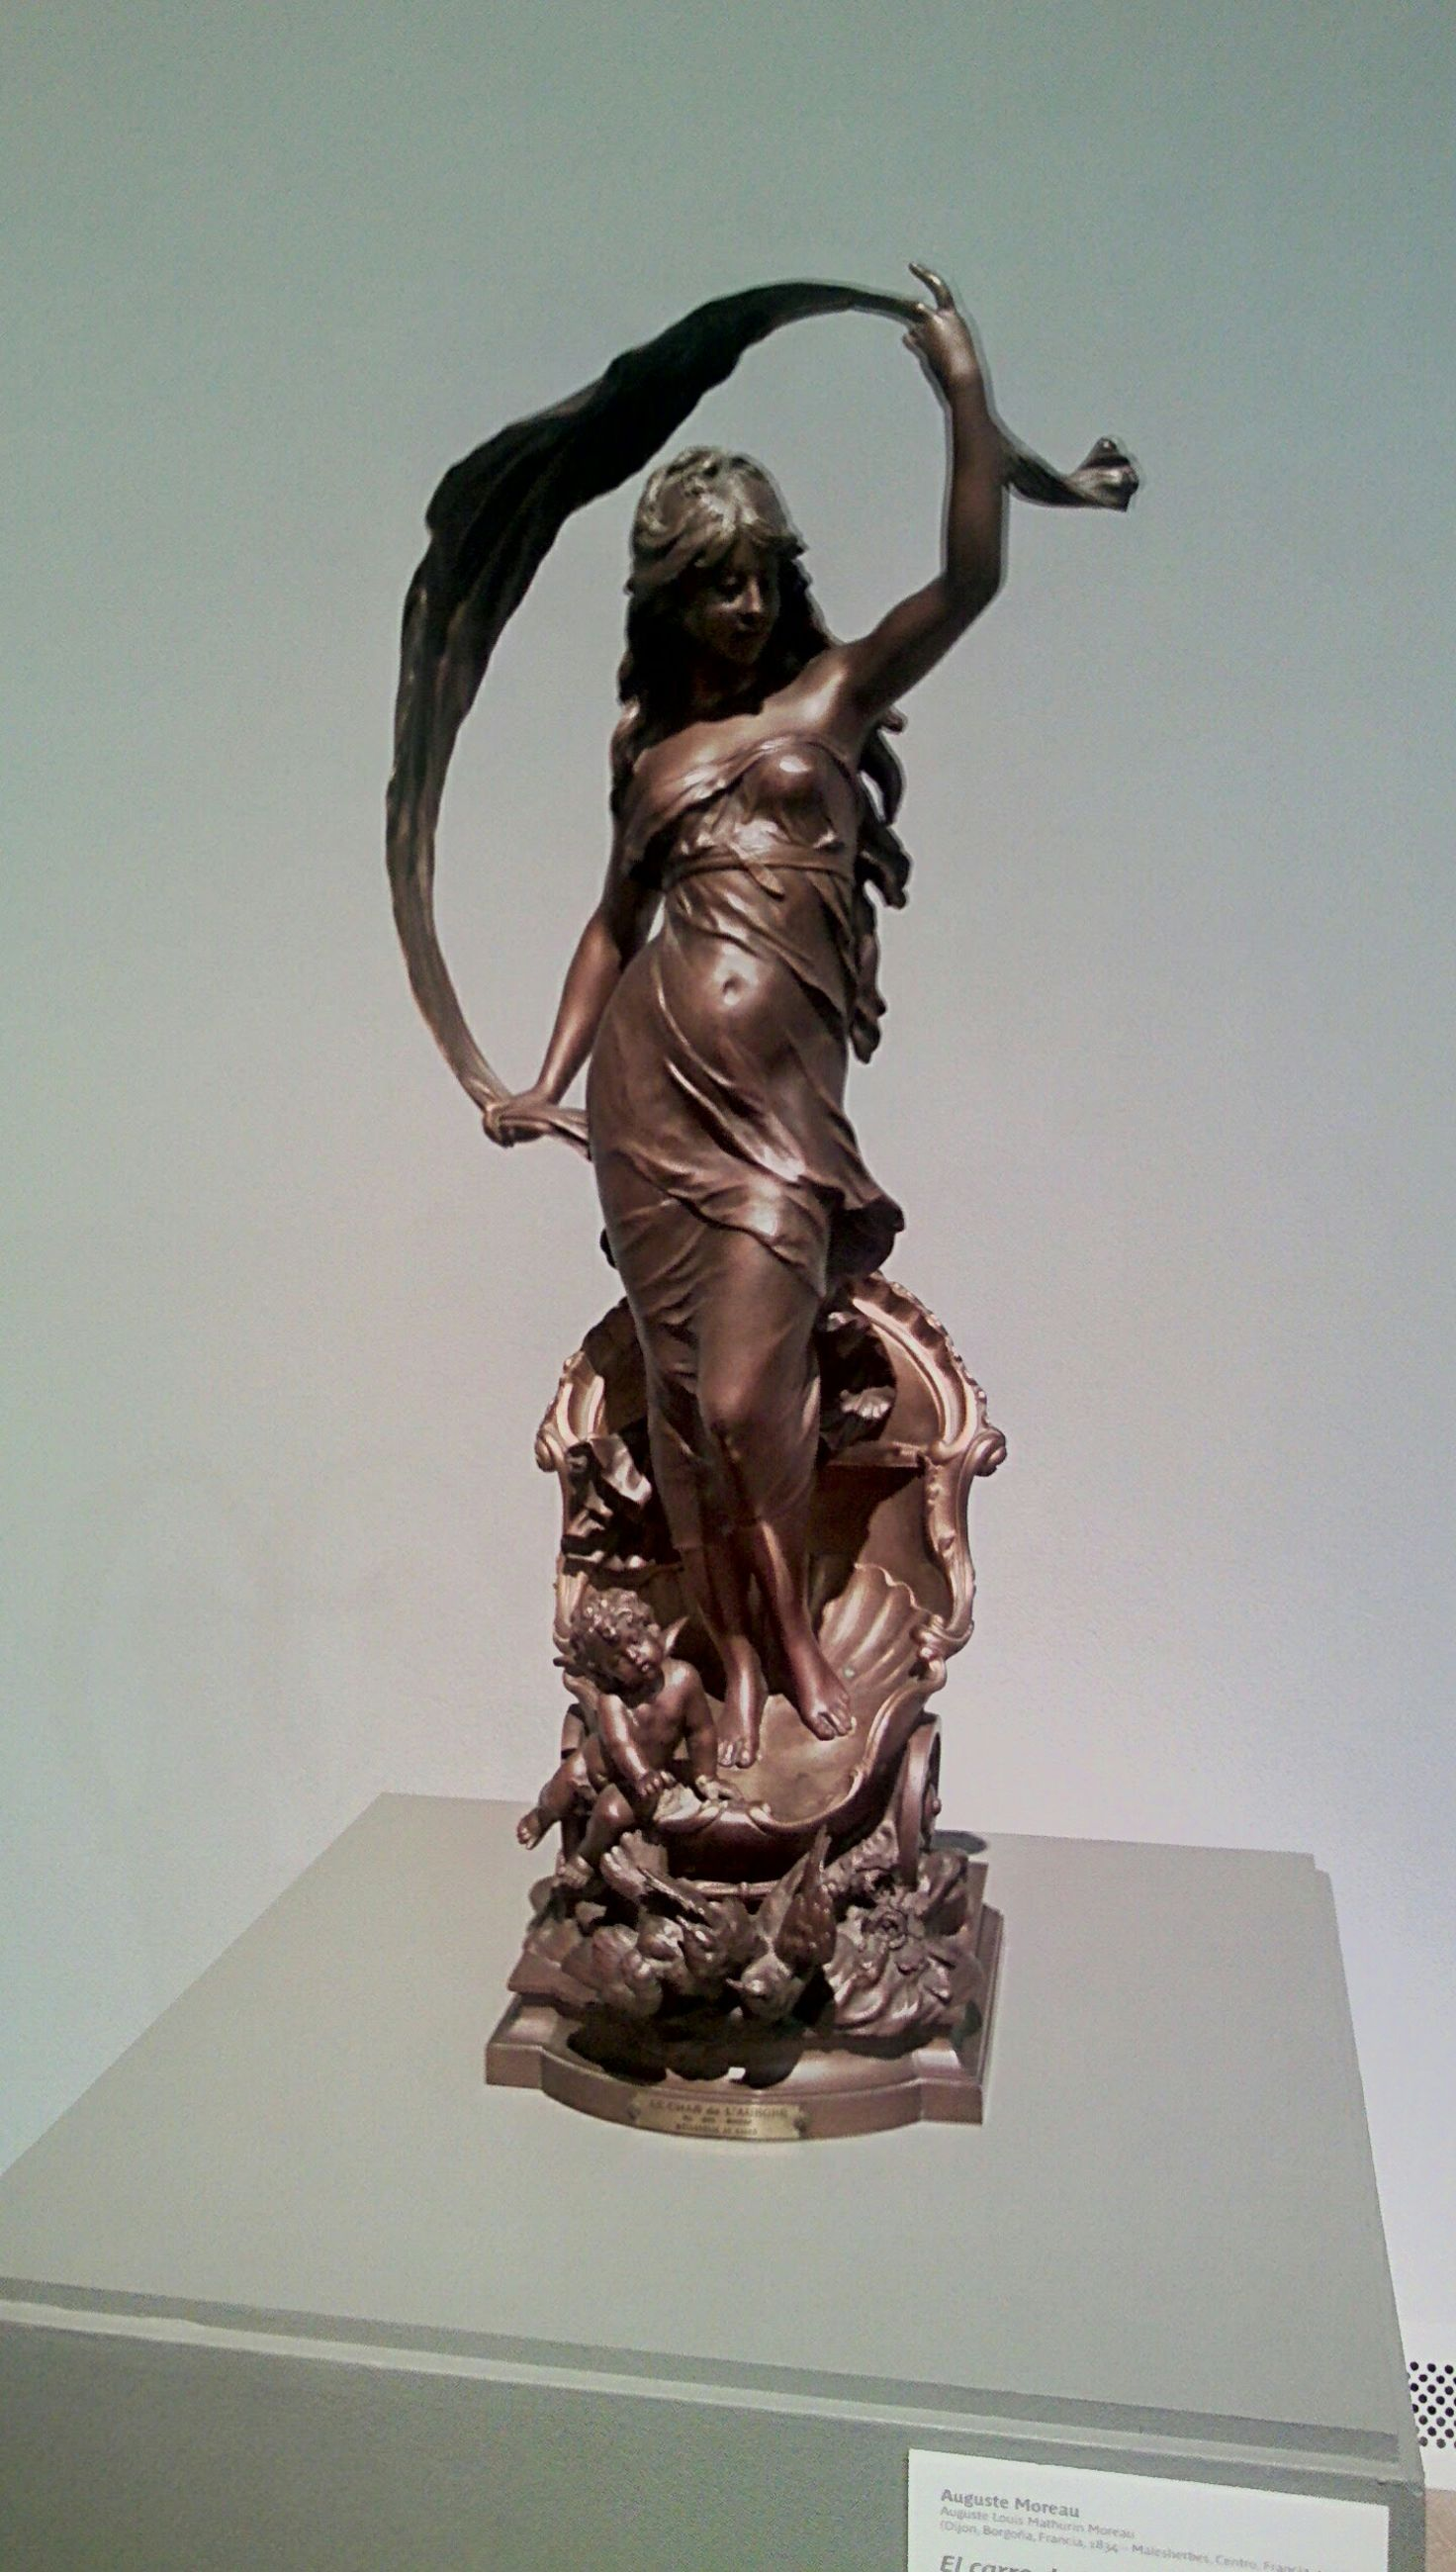 statue, sculpture, indoors, no people, day